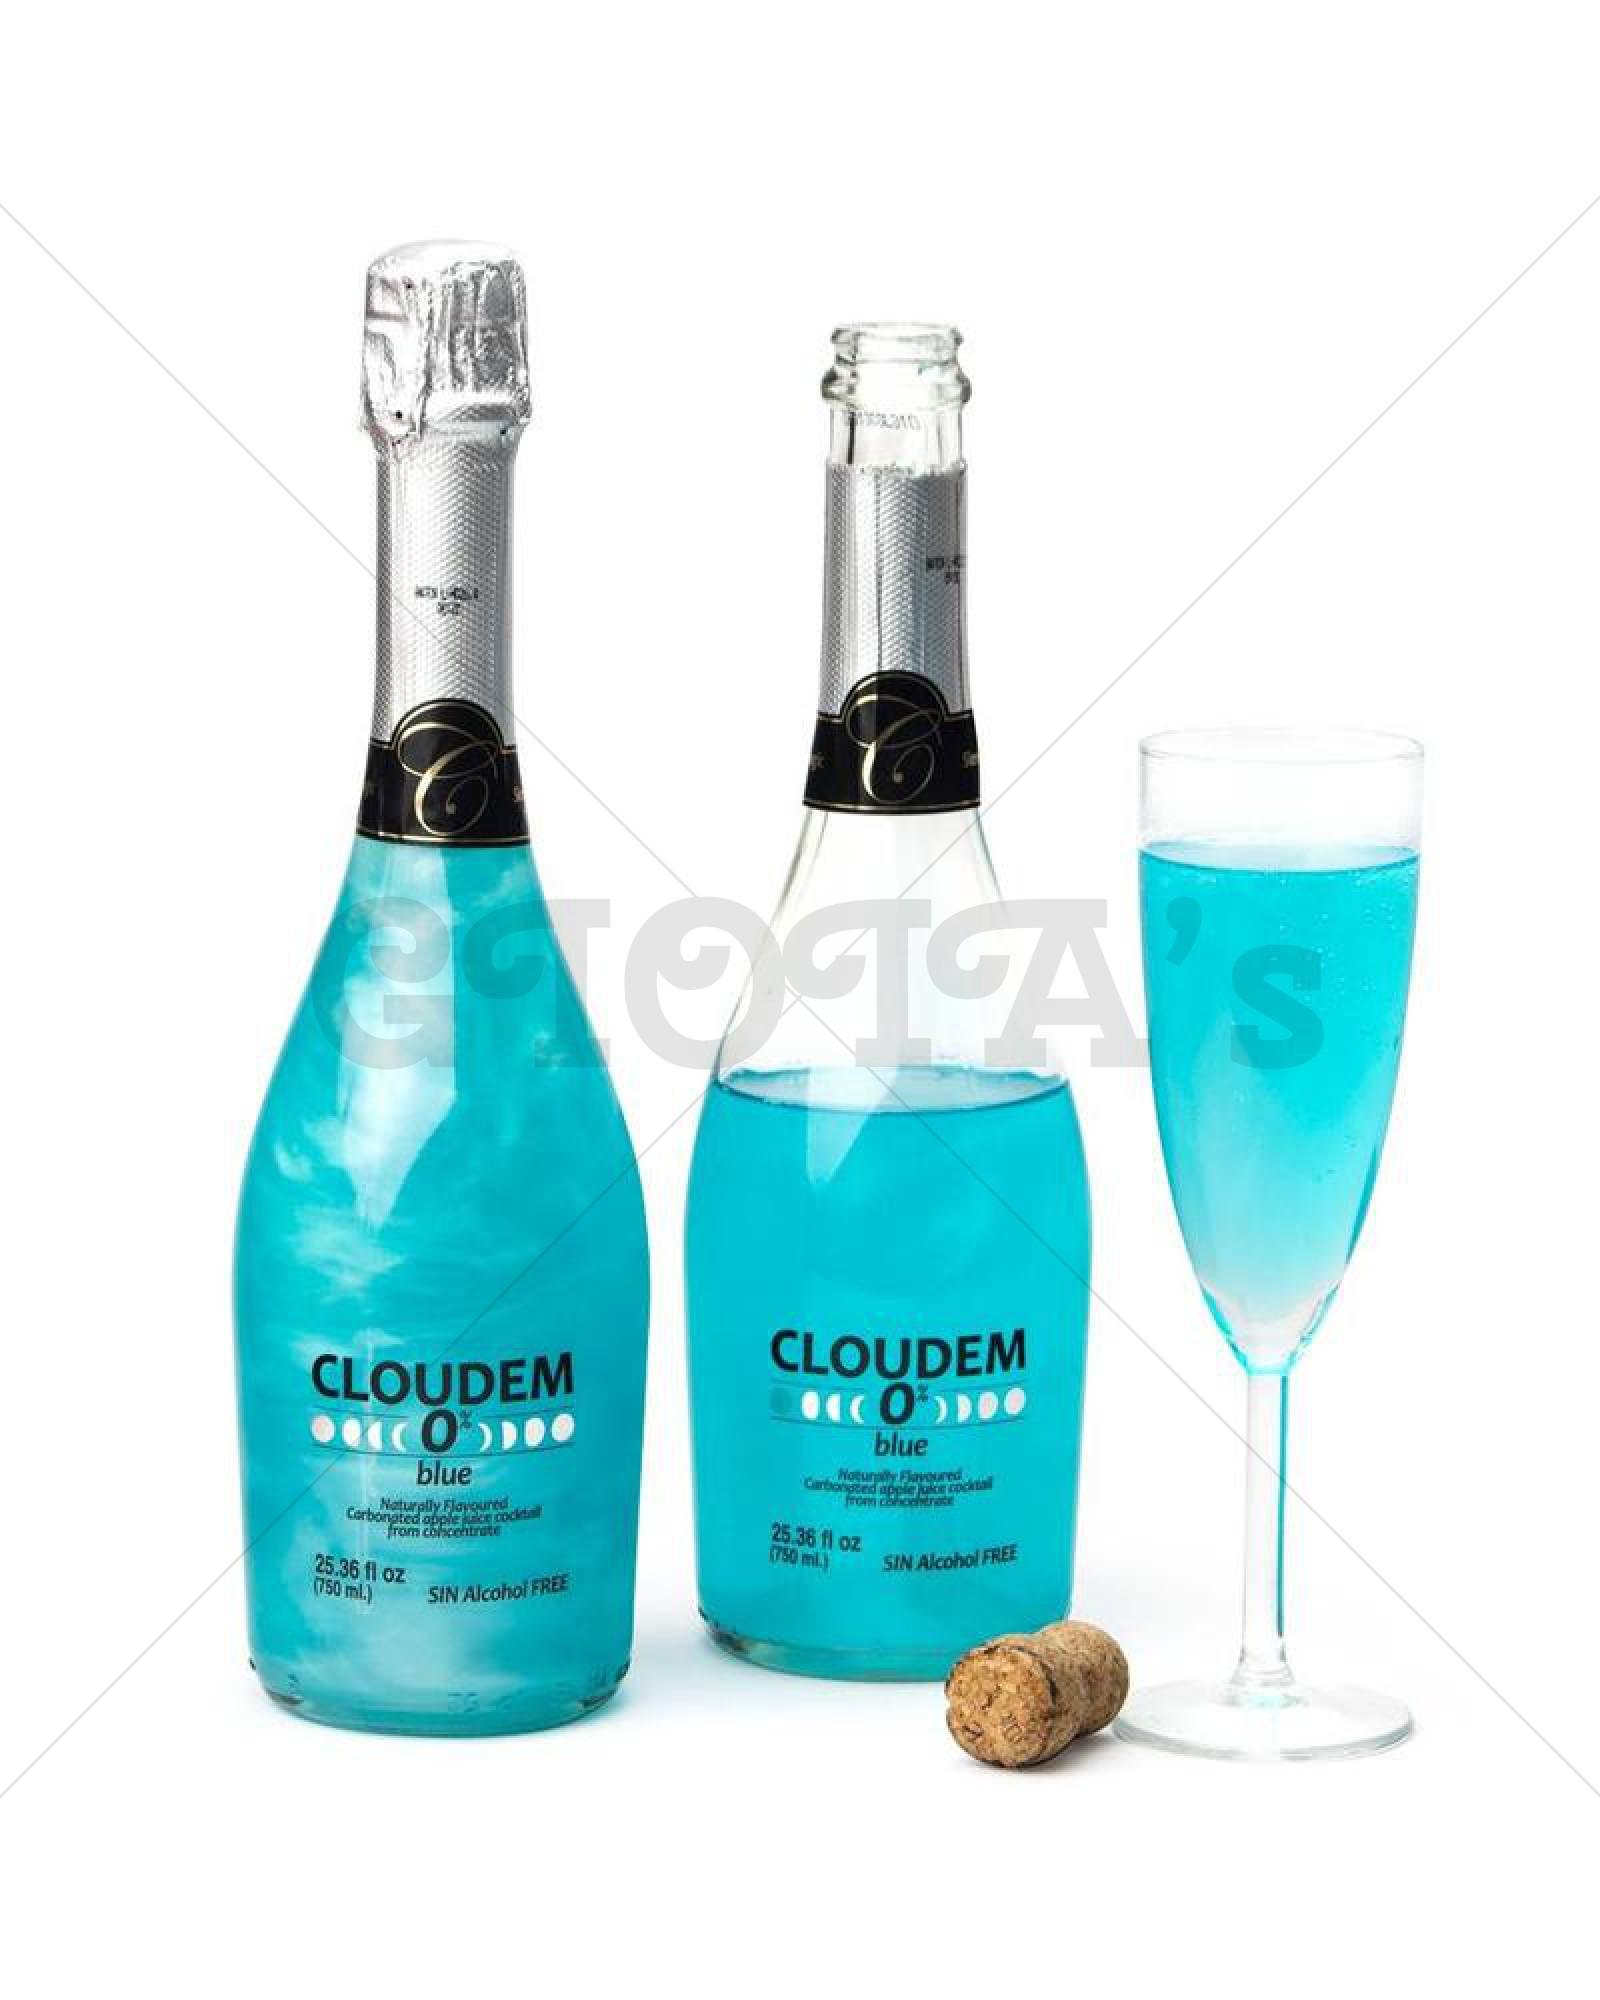 Cloudem blauw thema drank, babyshower drank, toost drank, onthulling-drank, feestdrank alcoholvrije drank 750ml